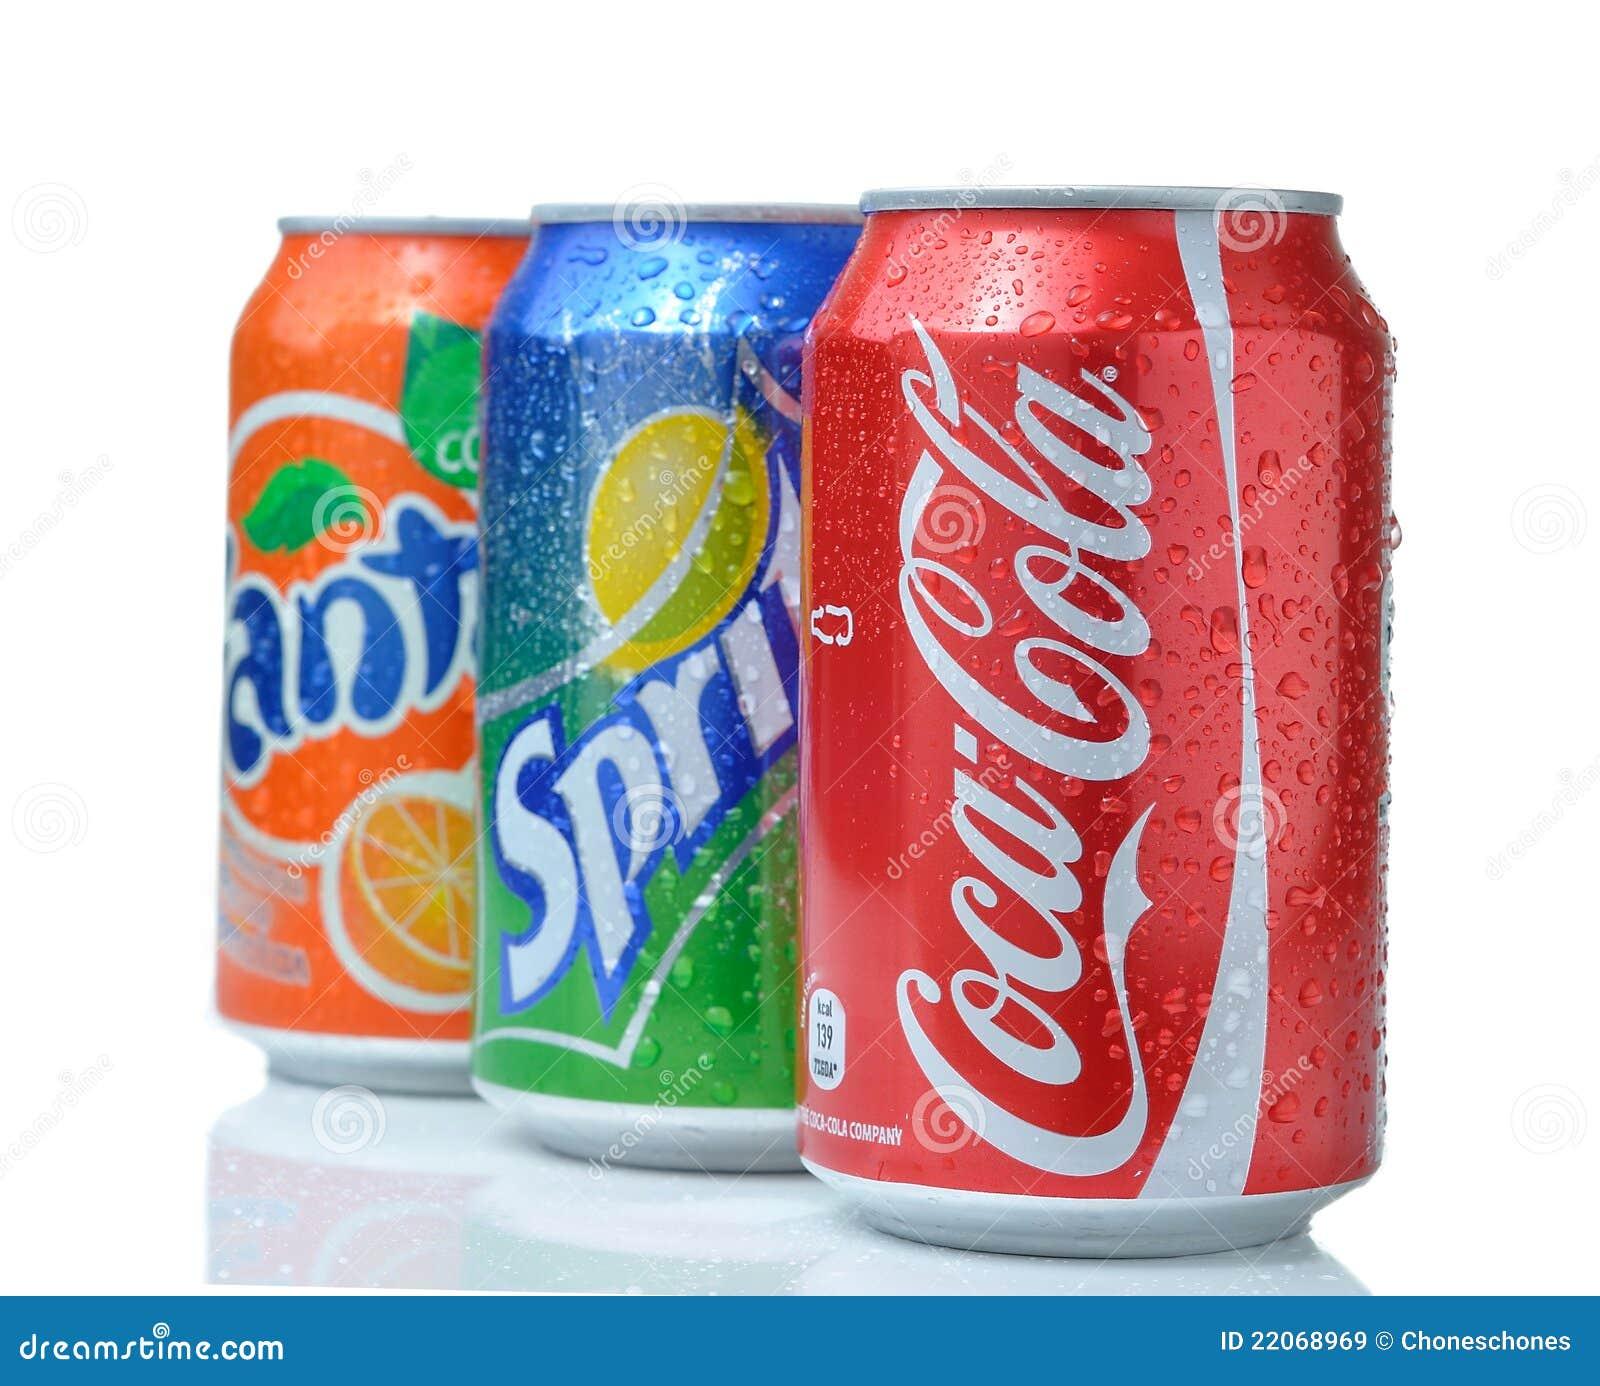 coca cola share the dream essay Classinro.